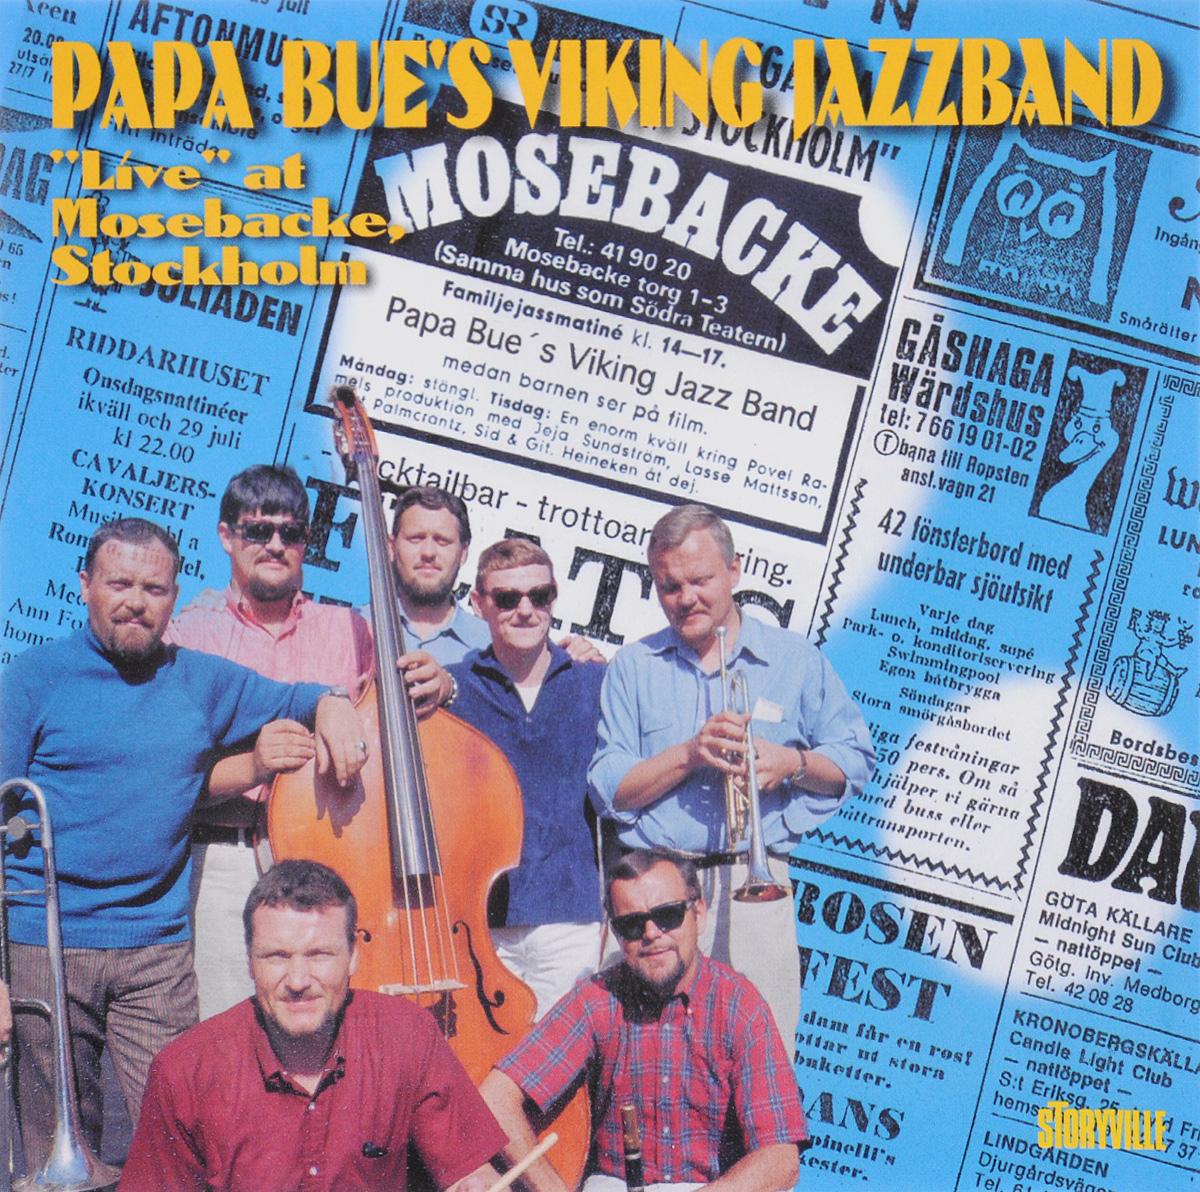 Papa Bue's Viking Jazz Band Papa Bue's Viking Jazzband. Live At Mosebacke, Stockholm цена и фото